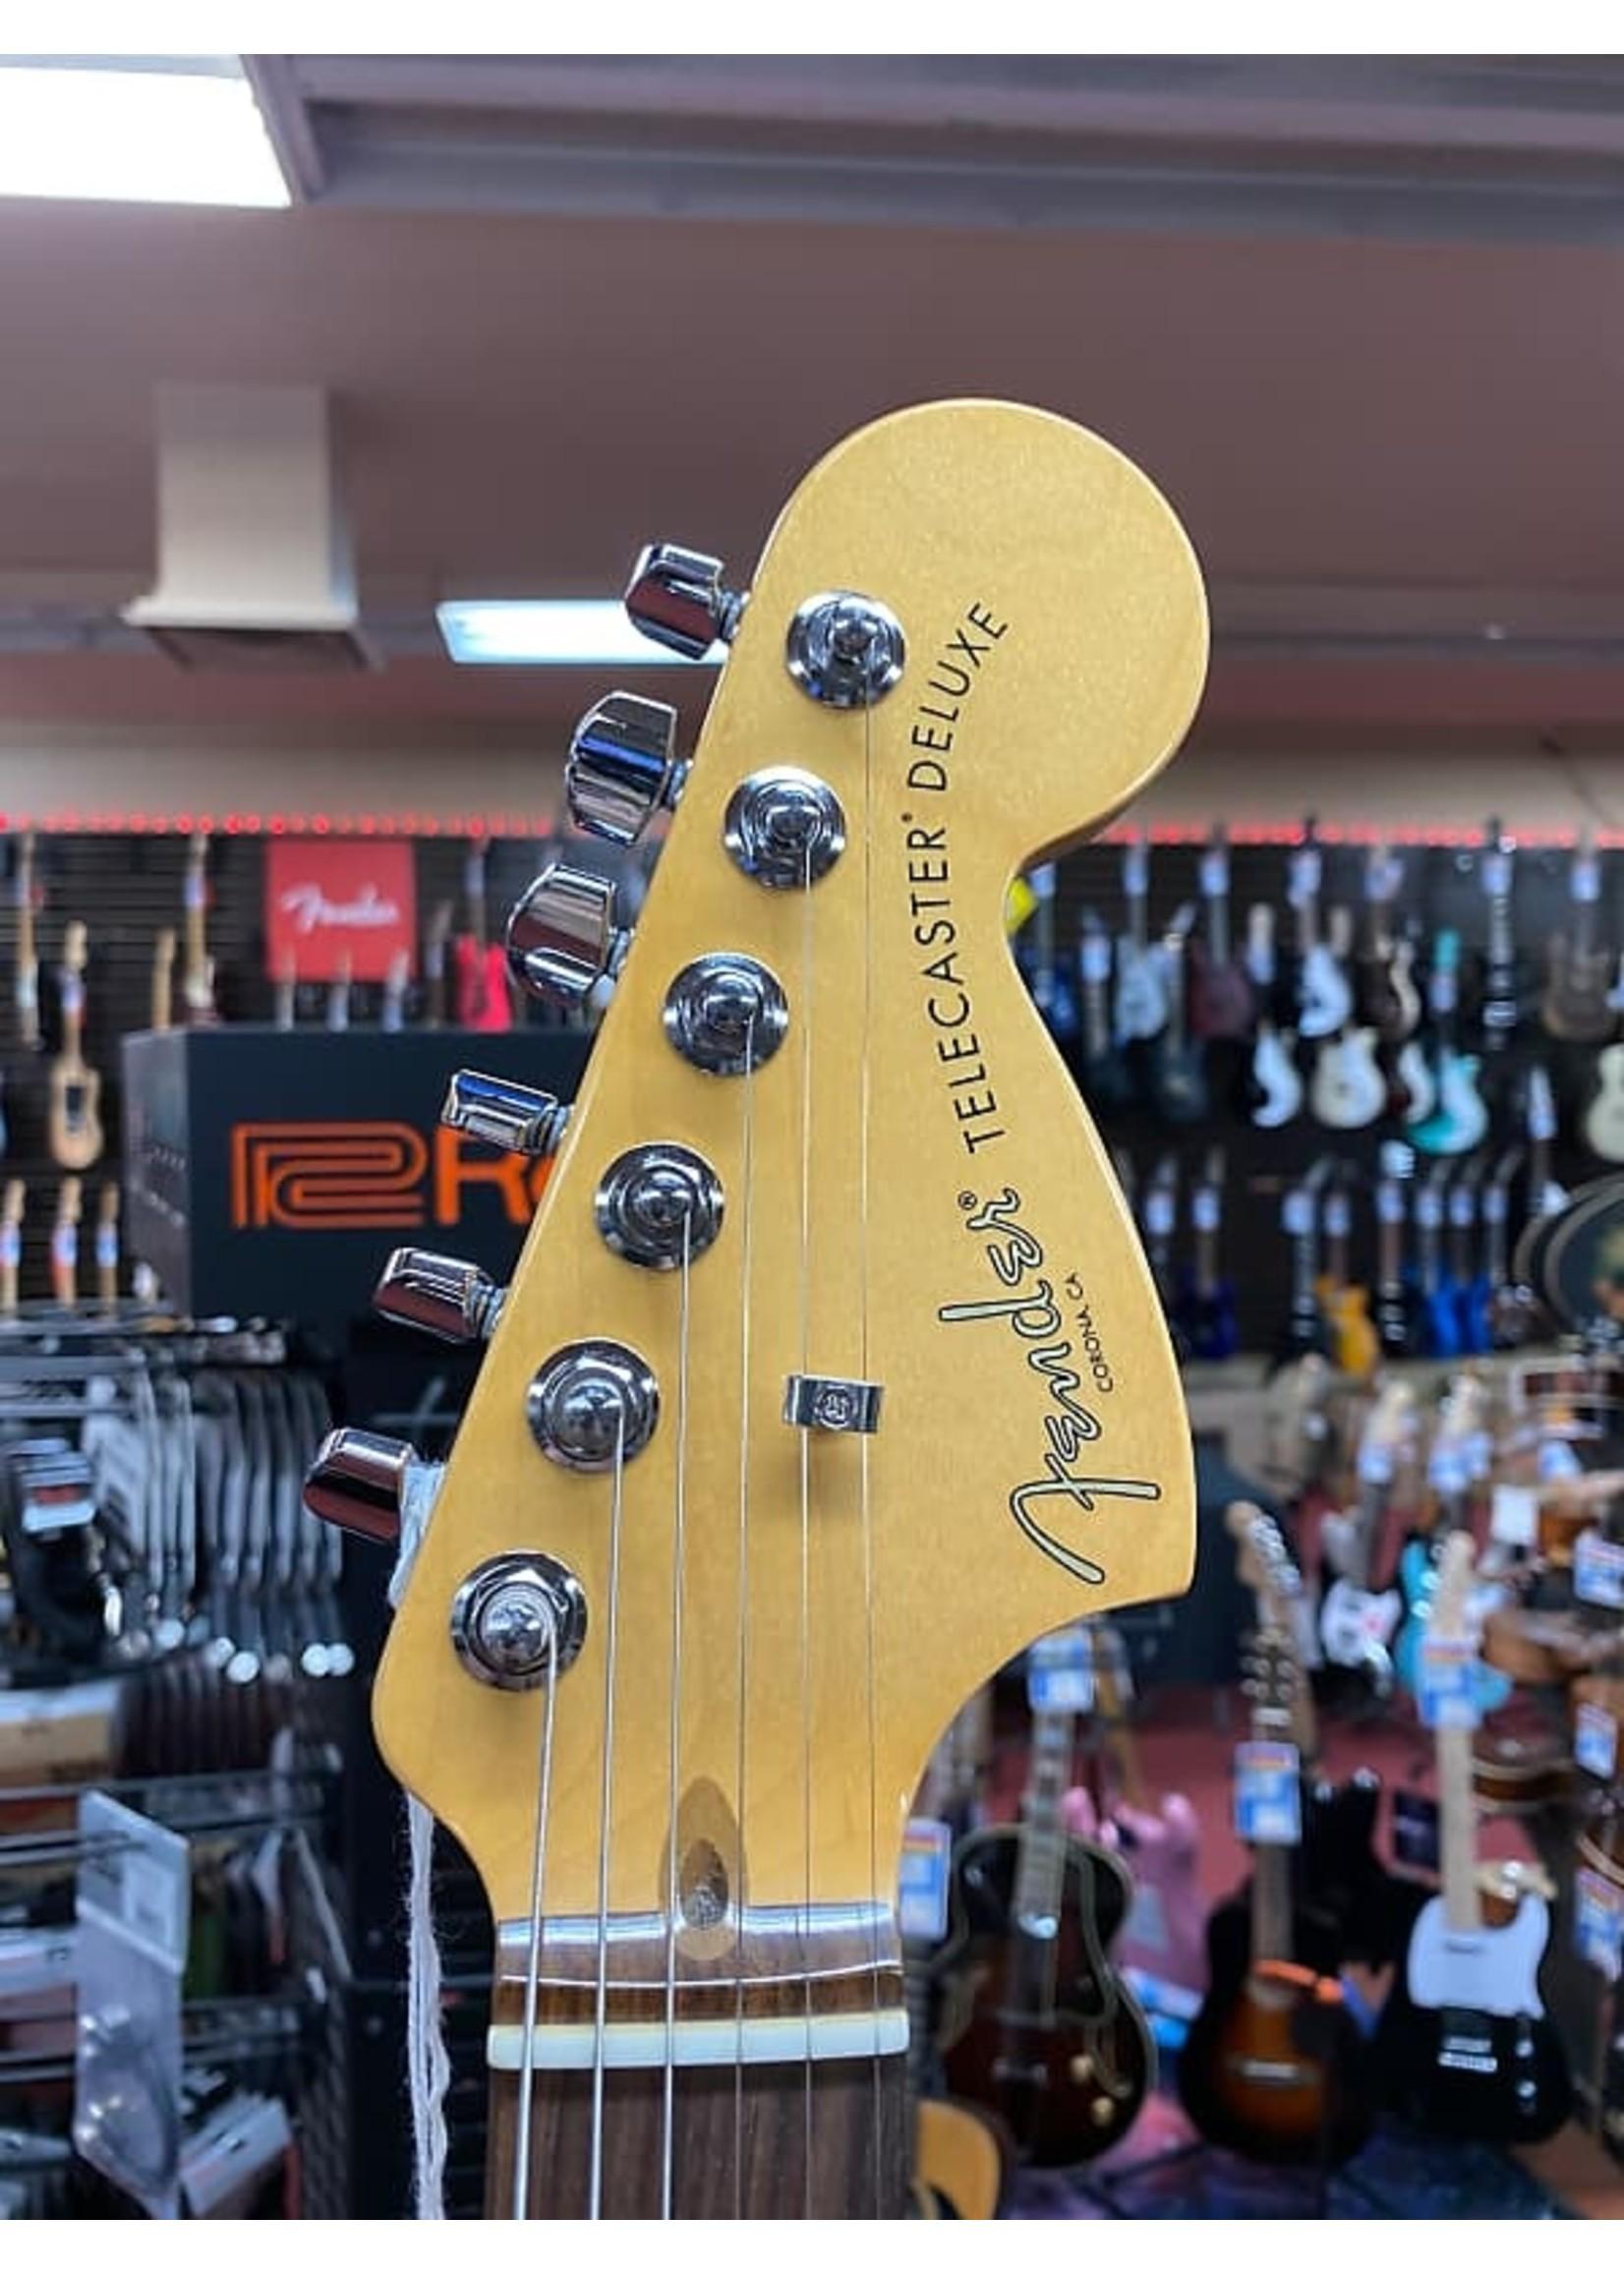 Fender Fender American Professional II Telecaster® Deluxe, Rosewood Fingerboard, Dark Night